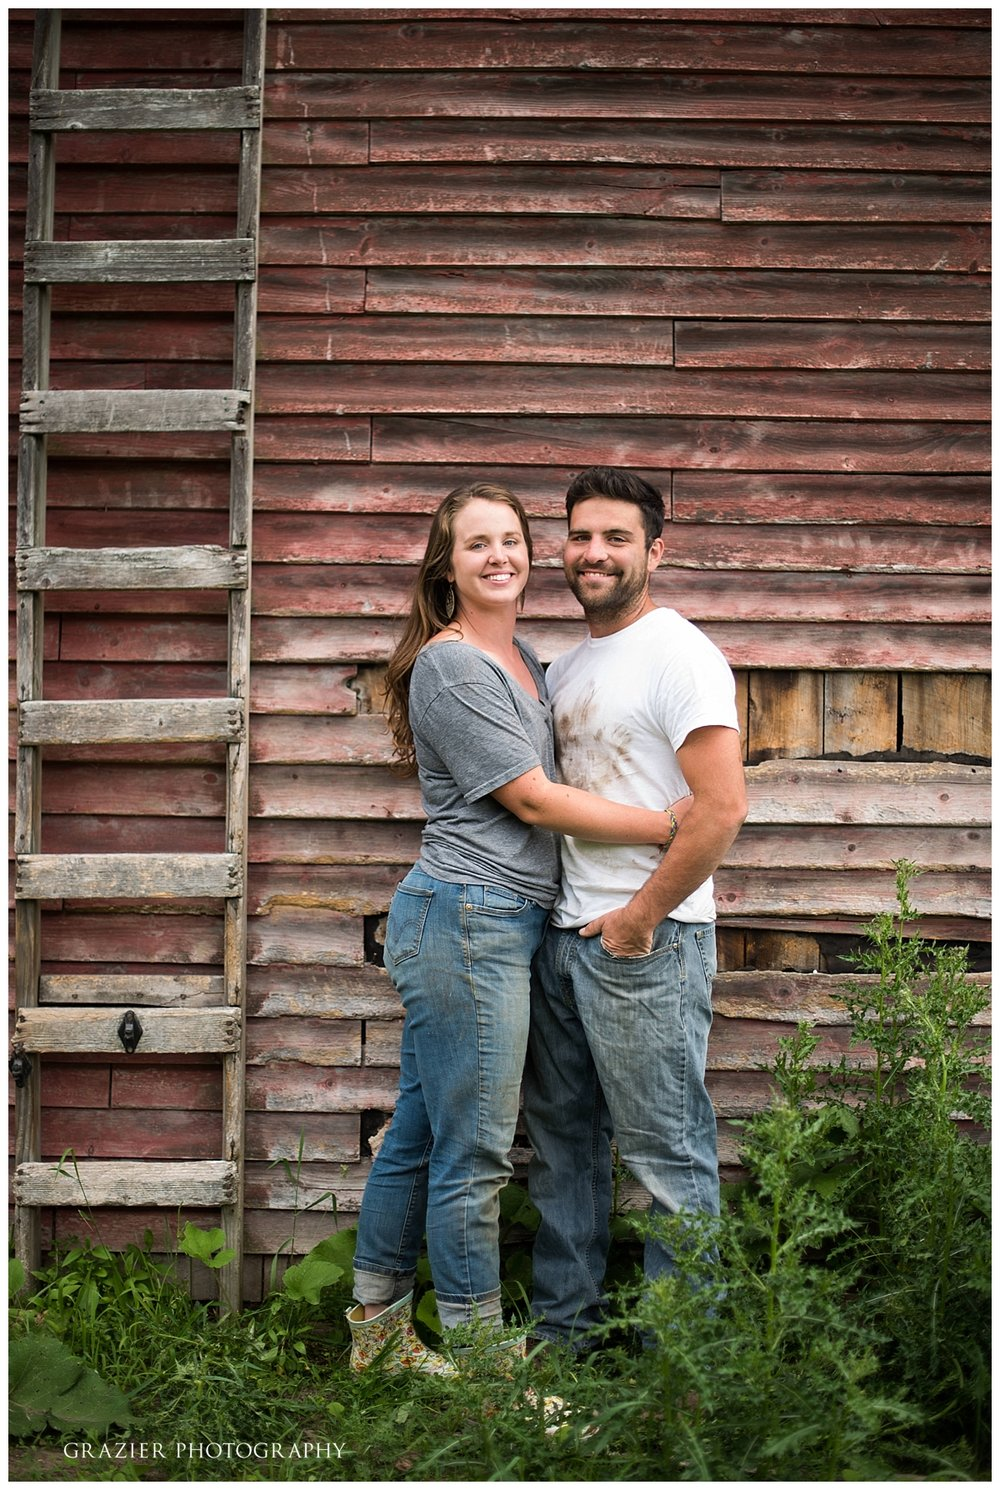 Farm Engagement Grazier Photography 2017-3_WEB.jpg